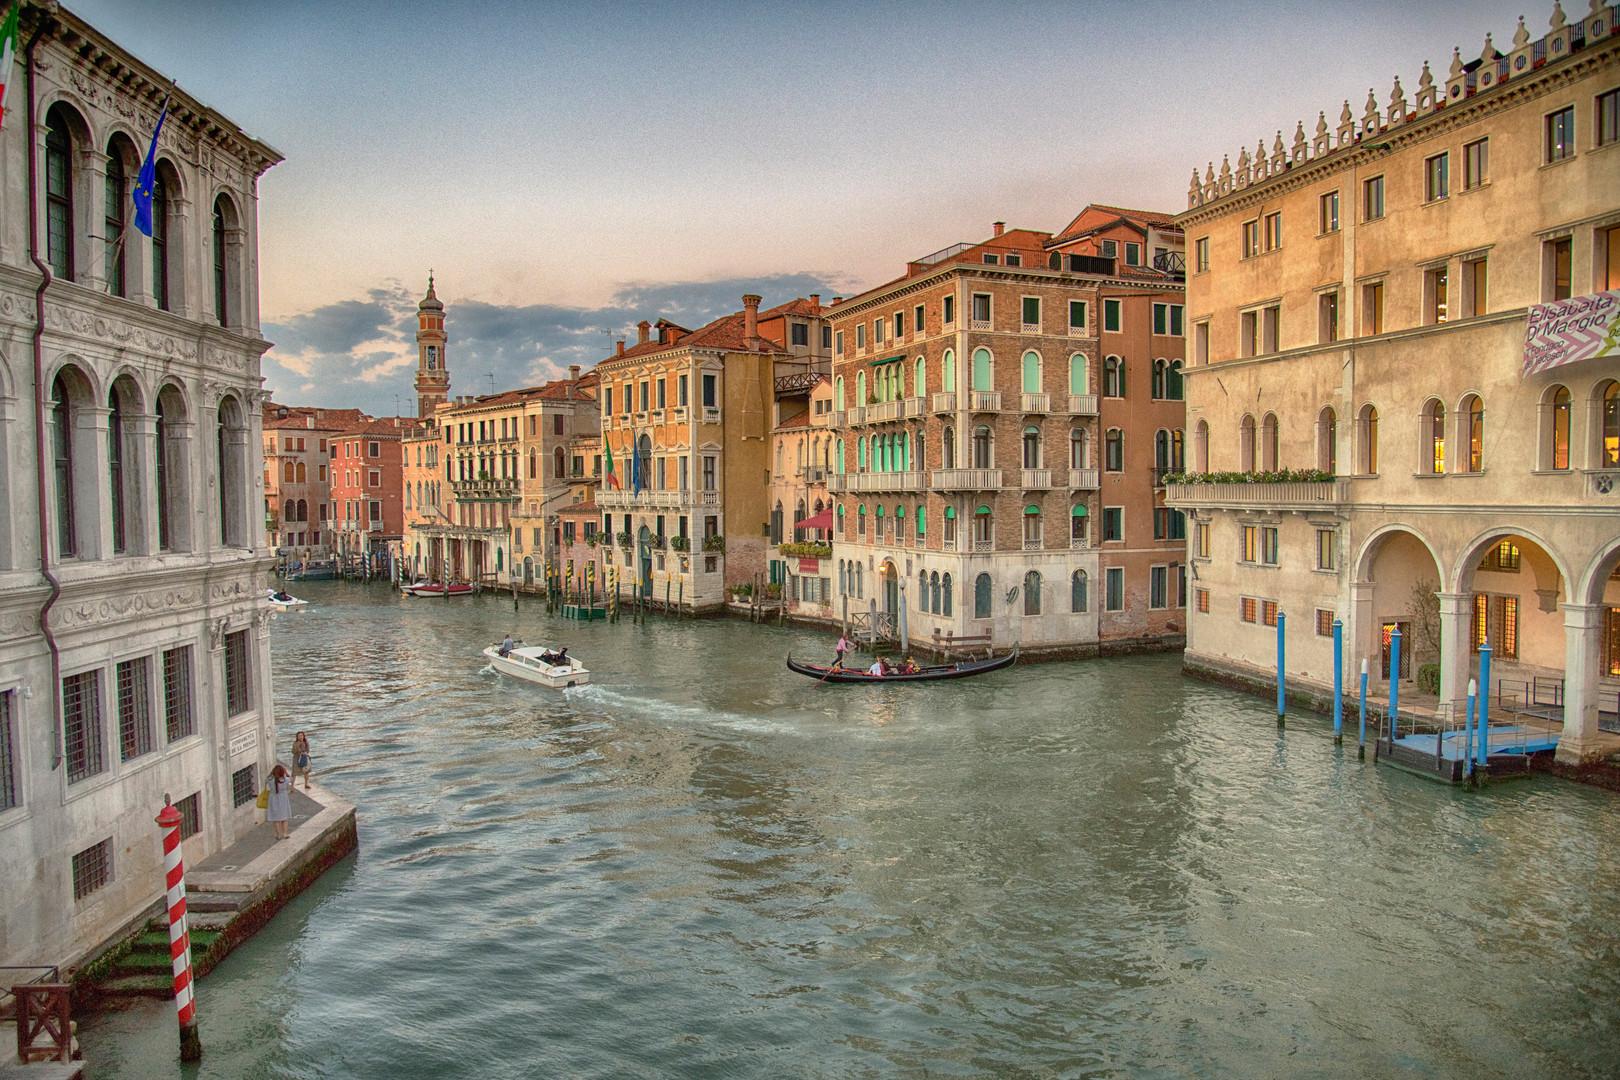 Venice Gran Canal - A.jpg